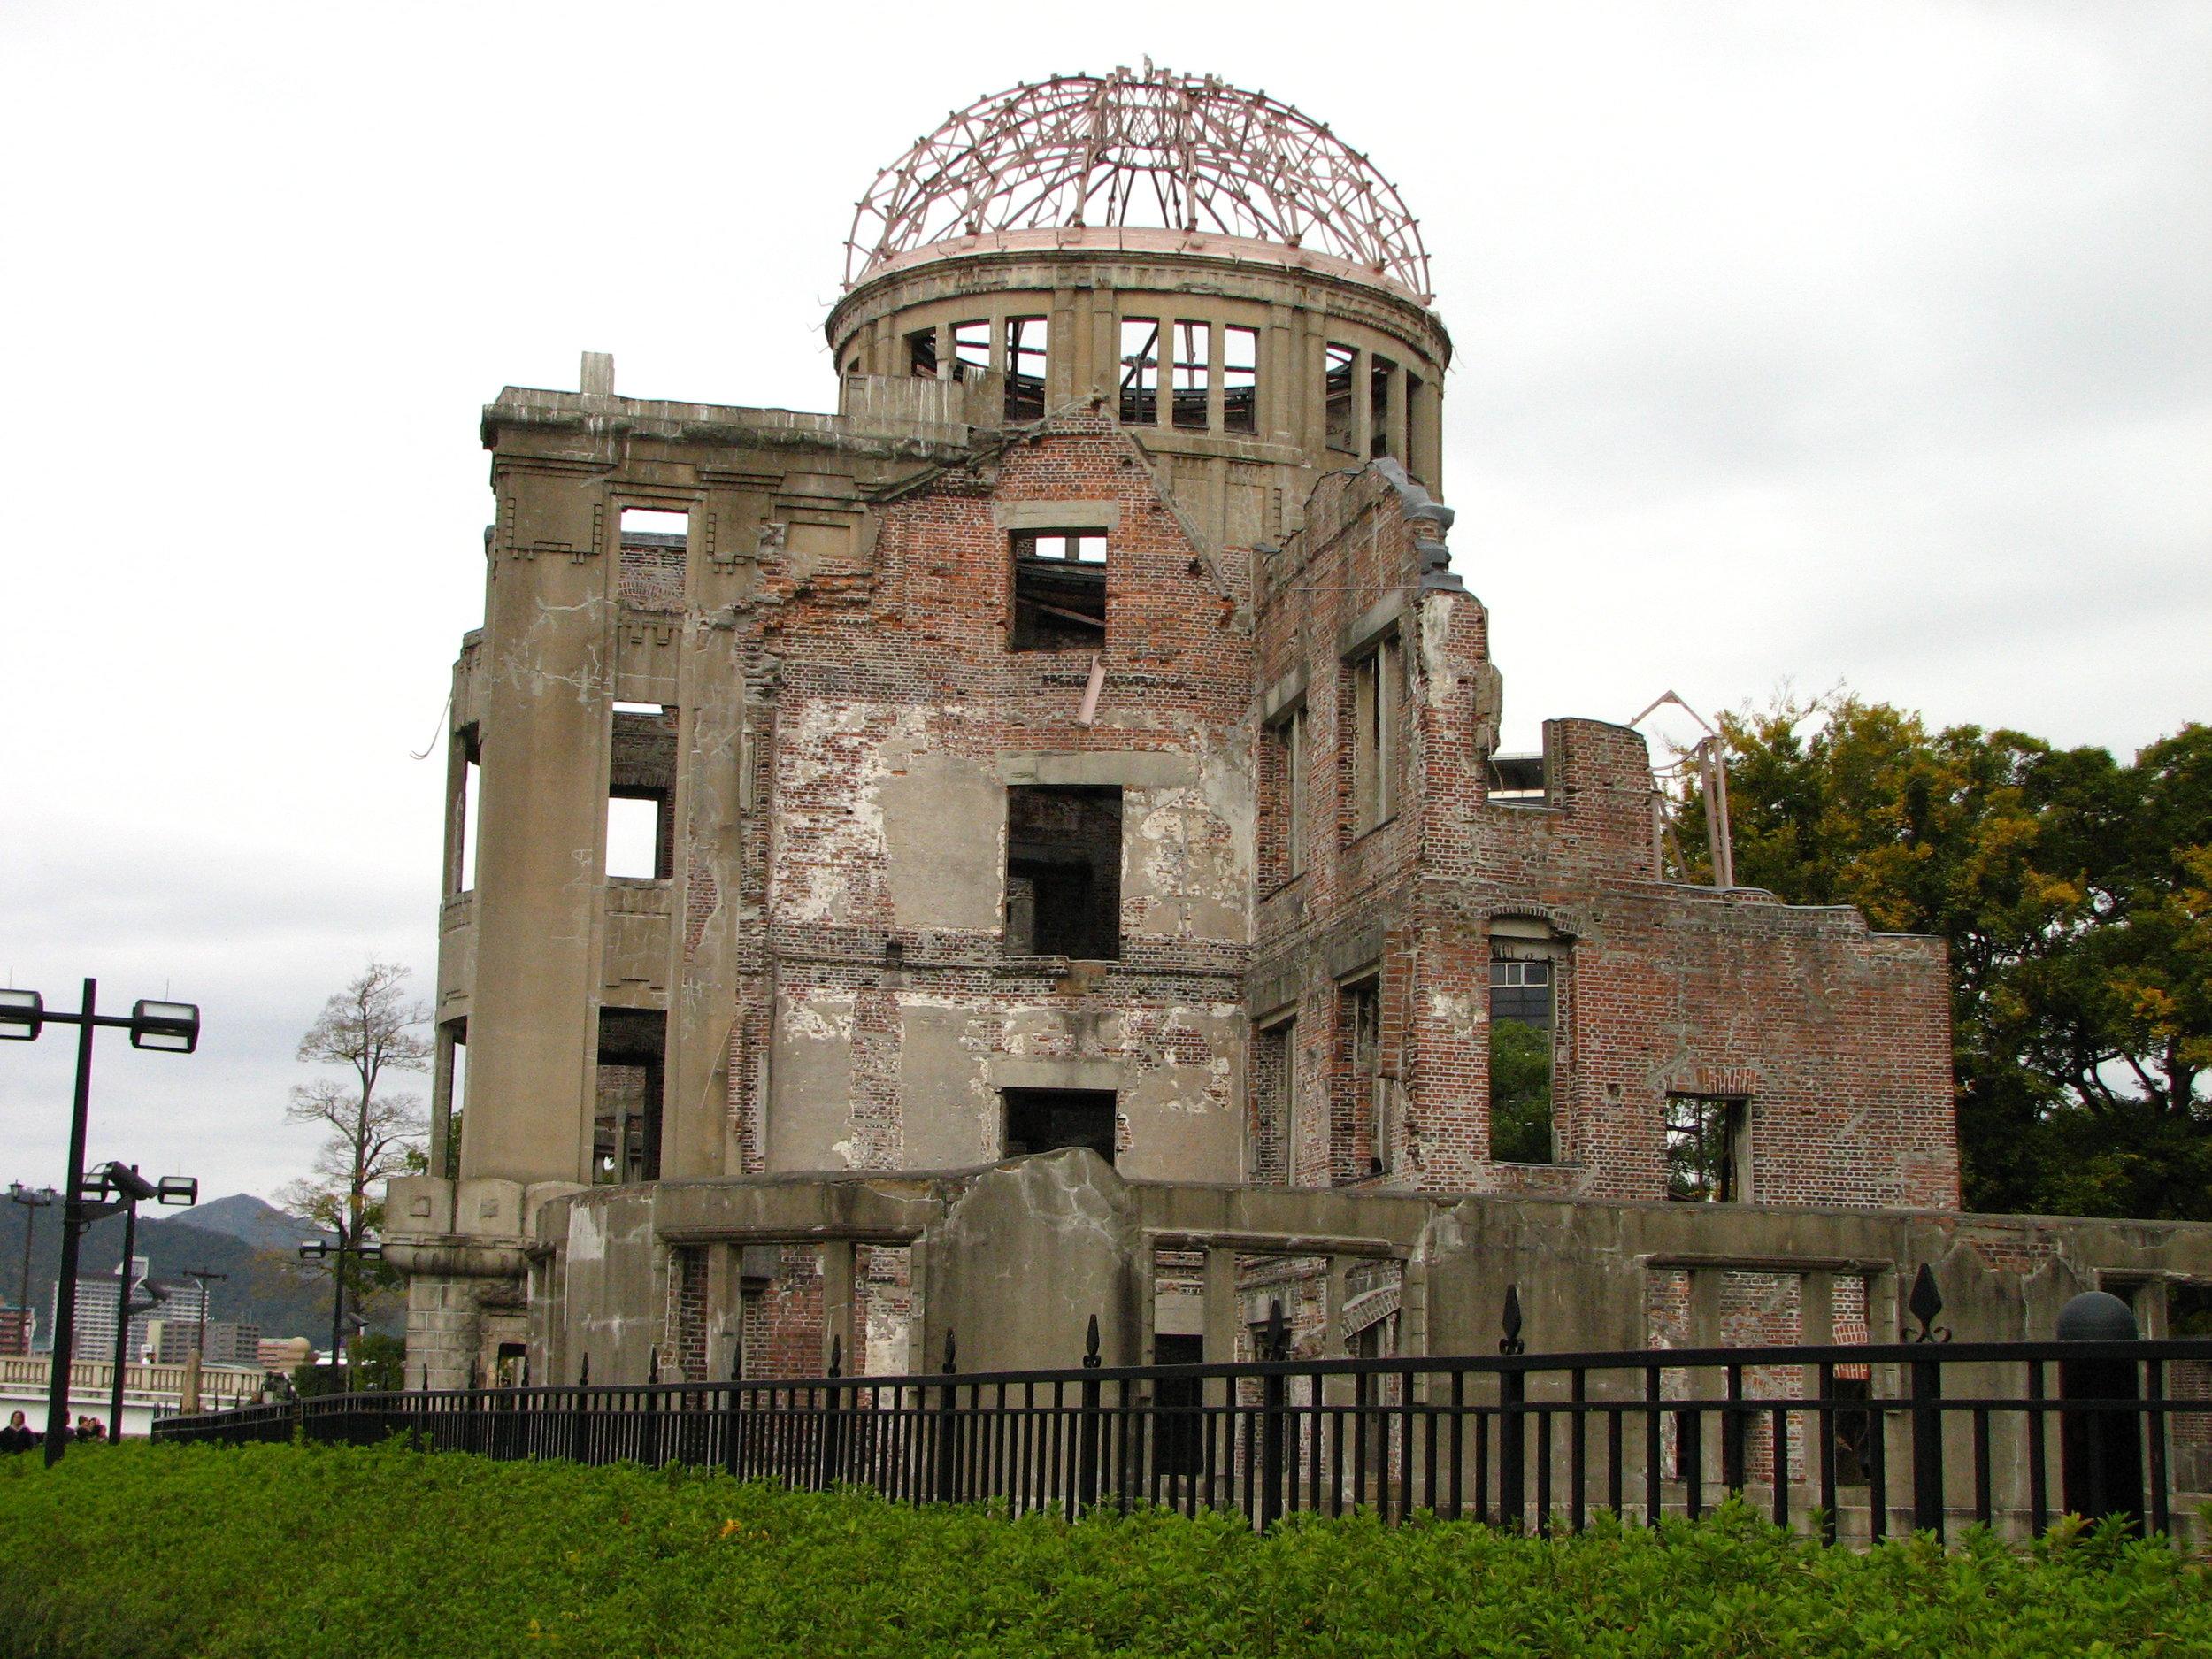 Genbaku Peace Dome, Hiroshima